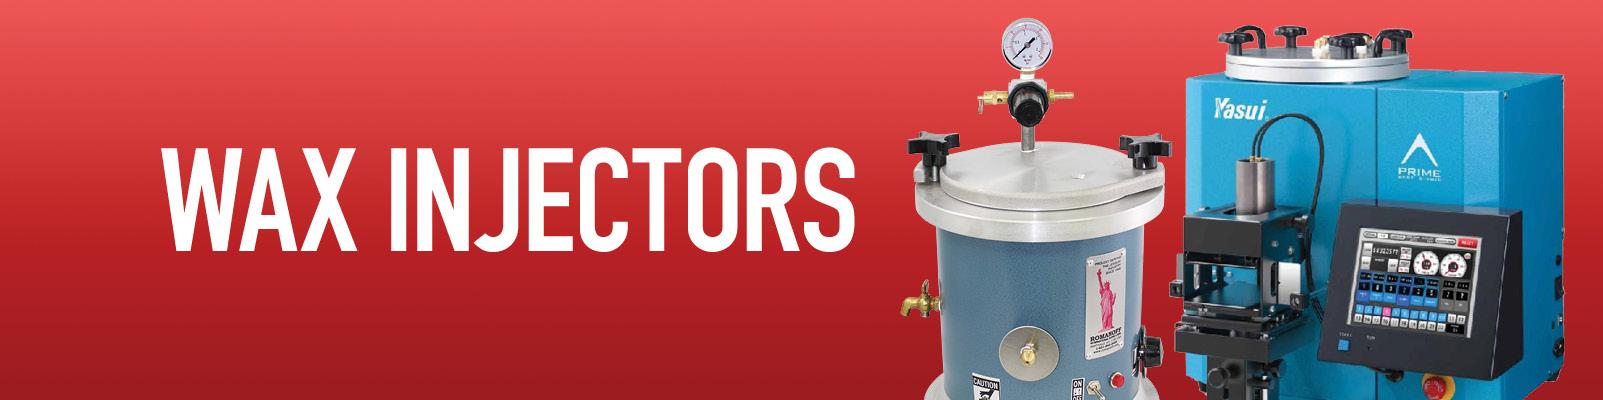 Wax Injectors & Accessories